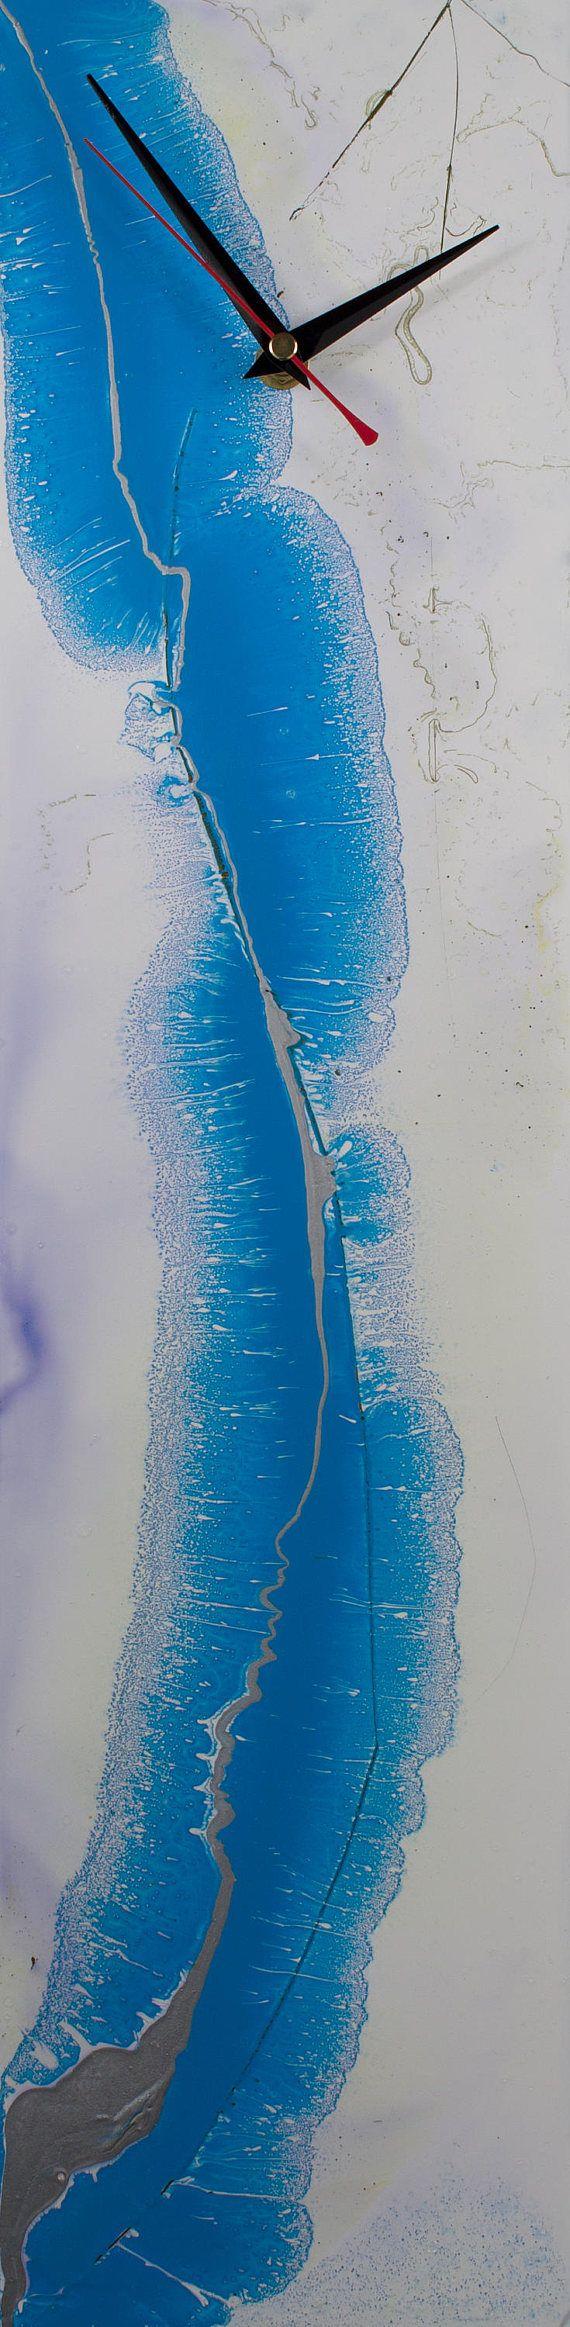 Window Treatments Glass Ornament Translucent Glass Art Abstract Suncatcher Sun Catcher Glass Wall Art Modern Clock Not Fused by ReformationsGlassArt Handmade Glass Clocks - by Craig Anthony. http://ift.tt/15oC6FM . Find it now at http://ift.tt/1WjbkVO!